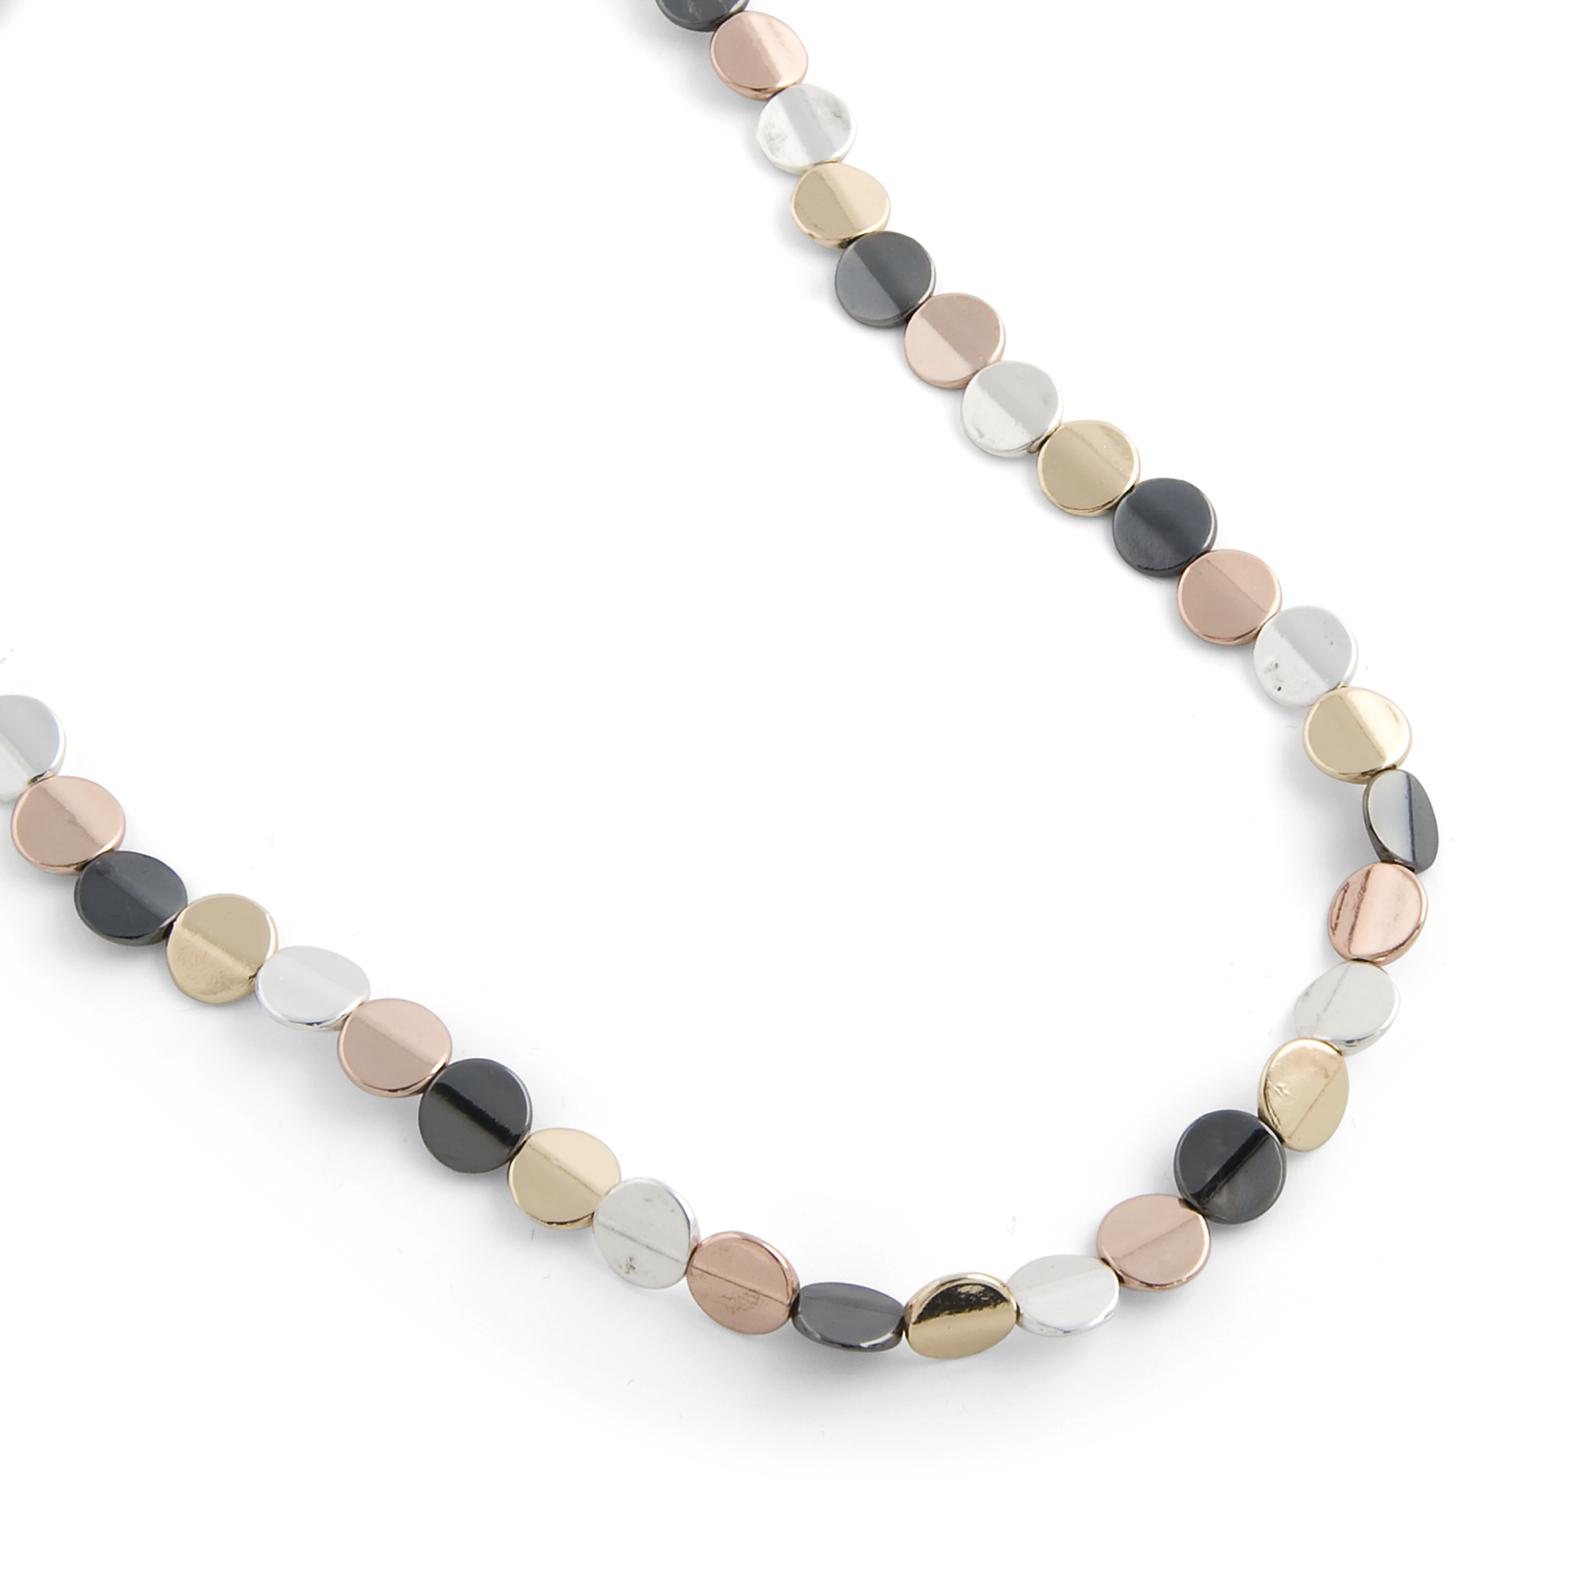 Damsmycke pfg Stockholm Pearls for Girls-Lotta Necklace 50 cm 90698-12